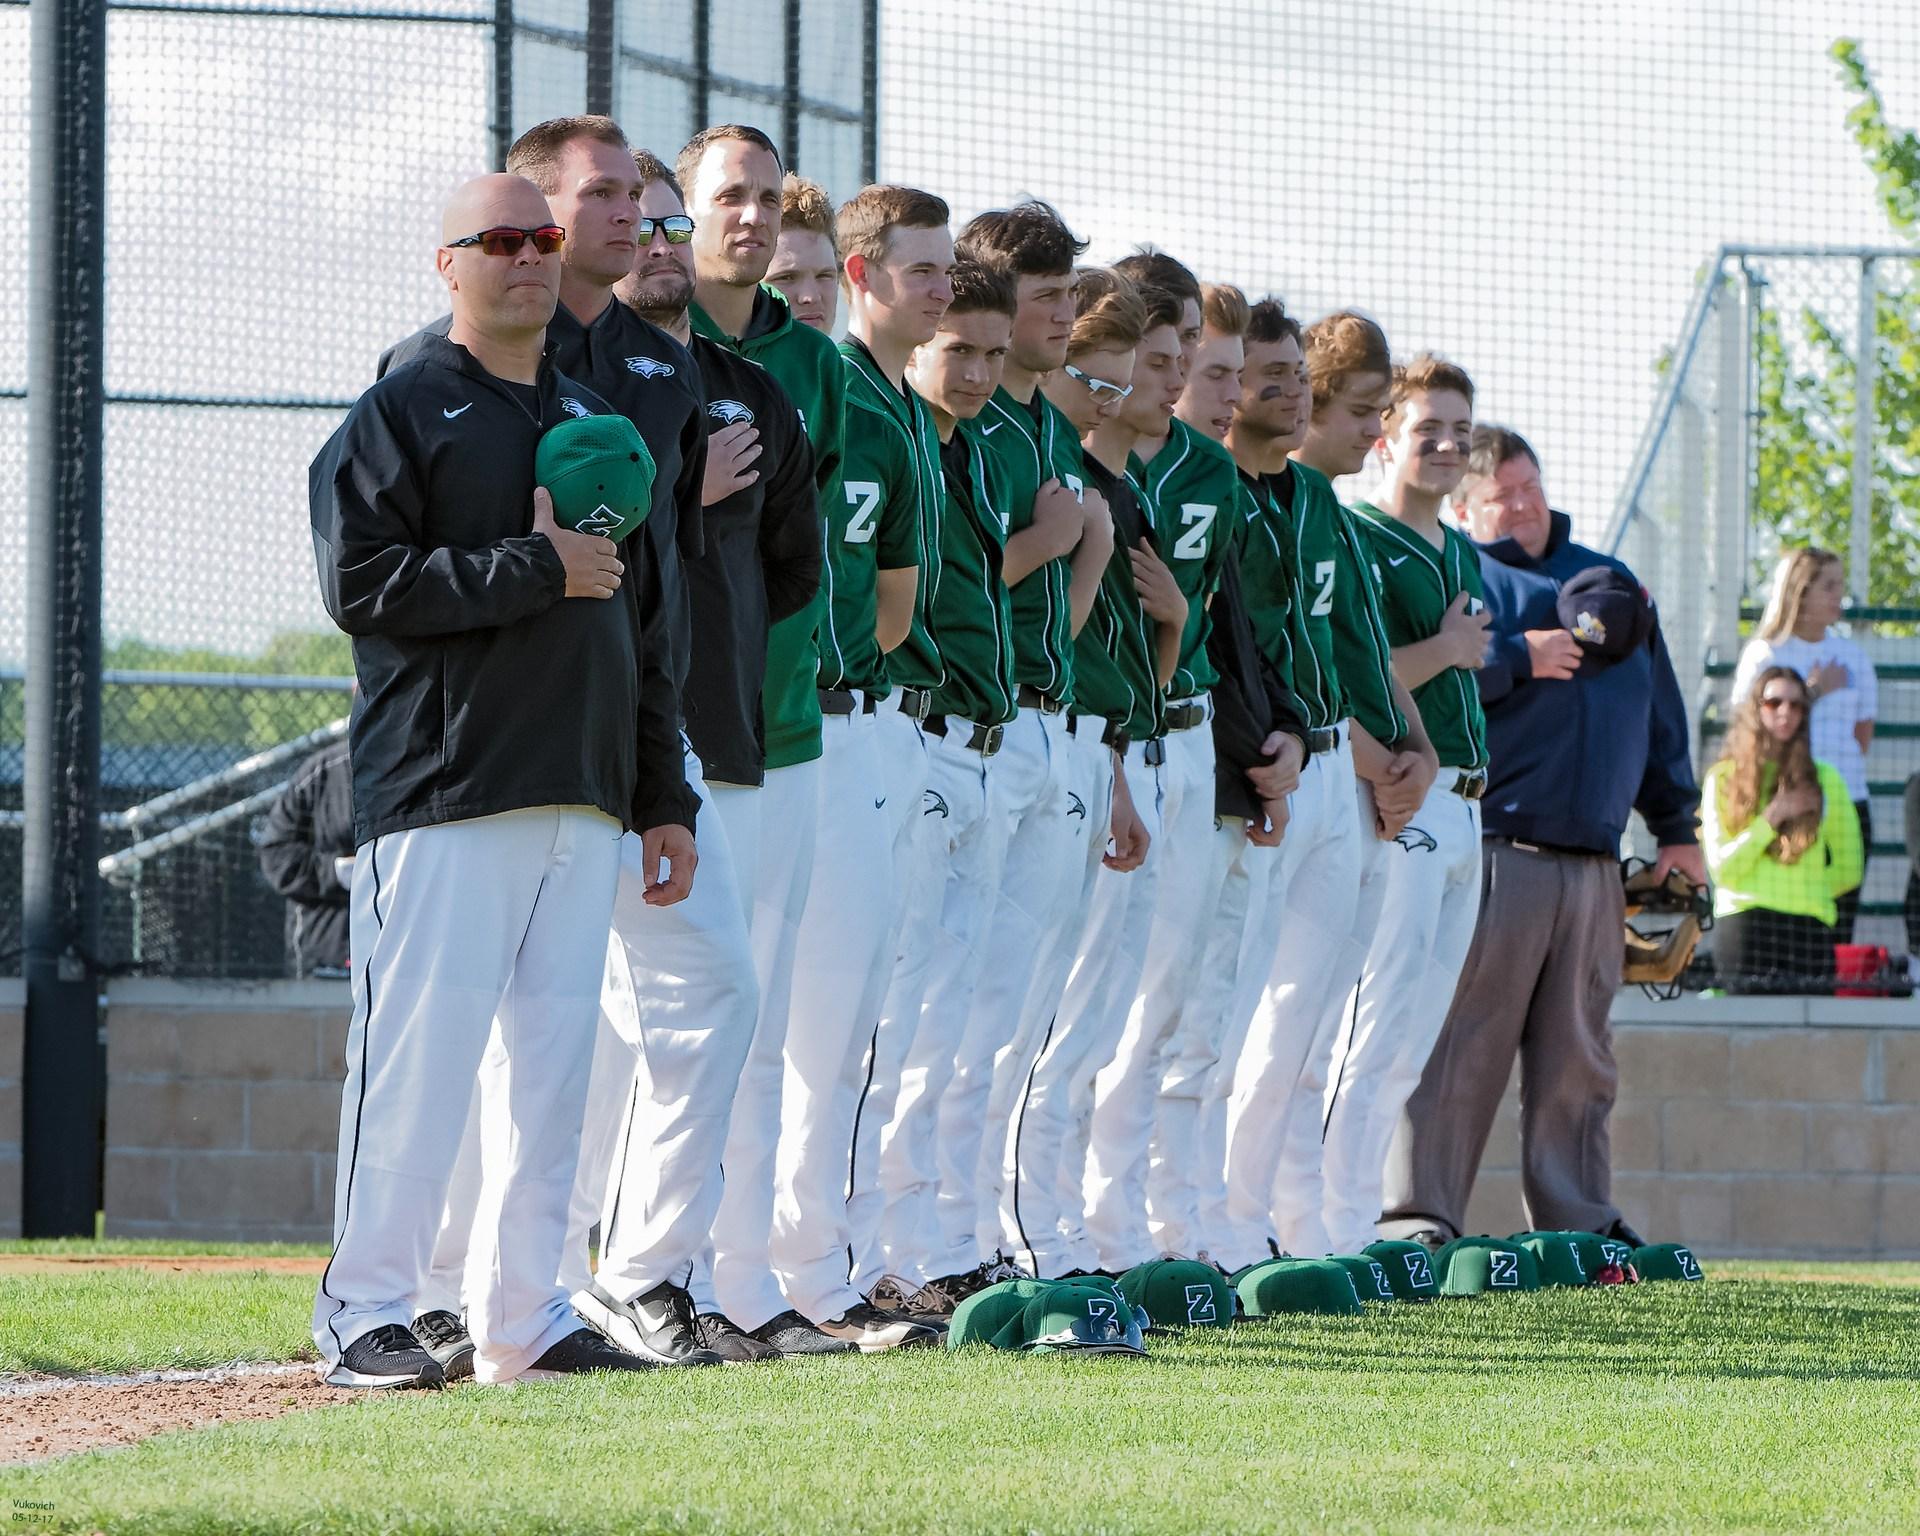 team photo during National Anthem